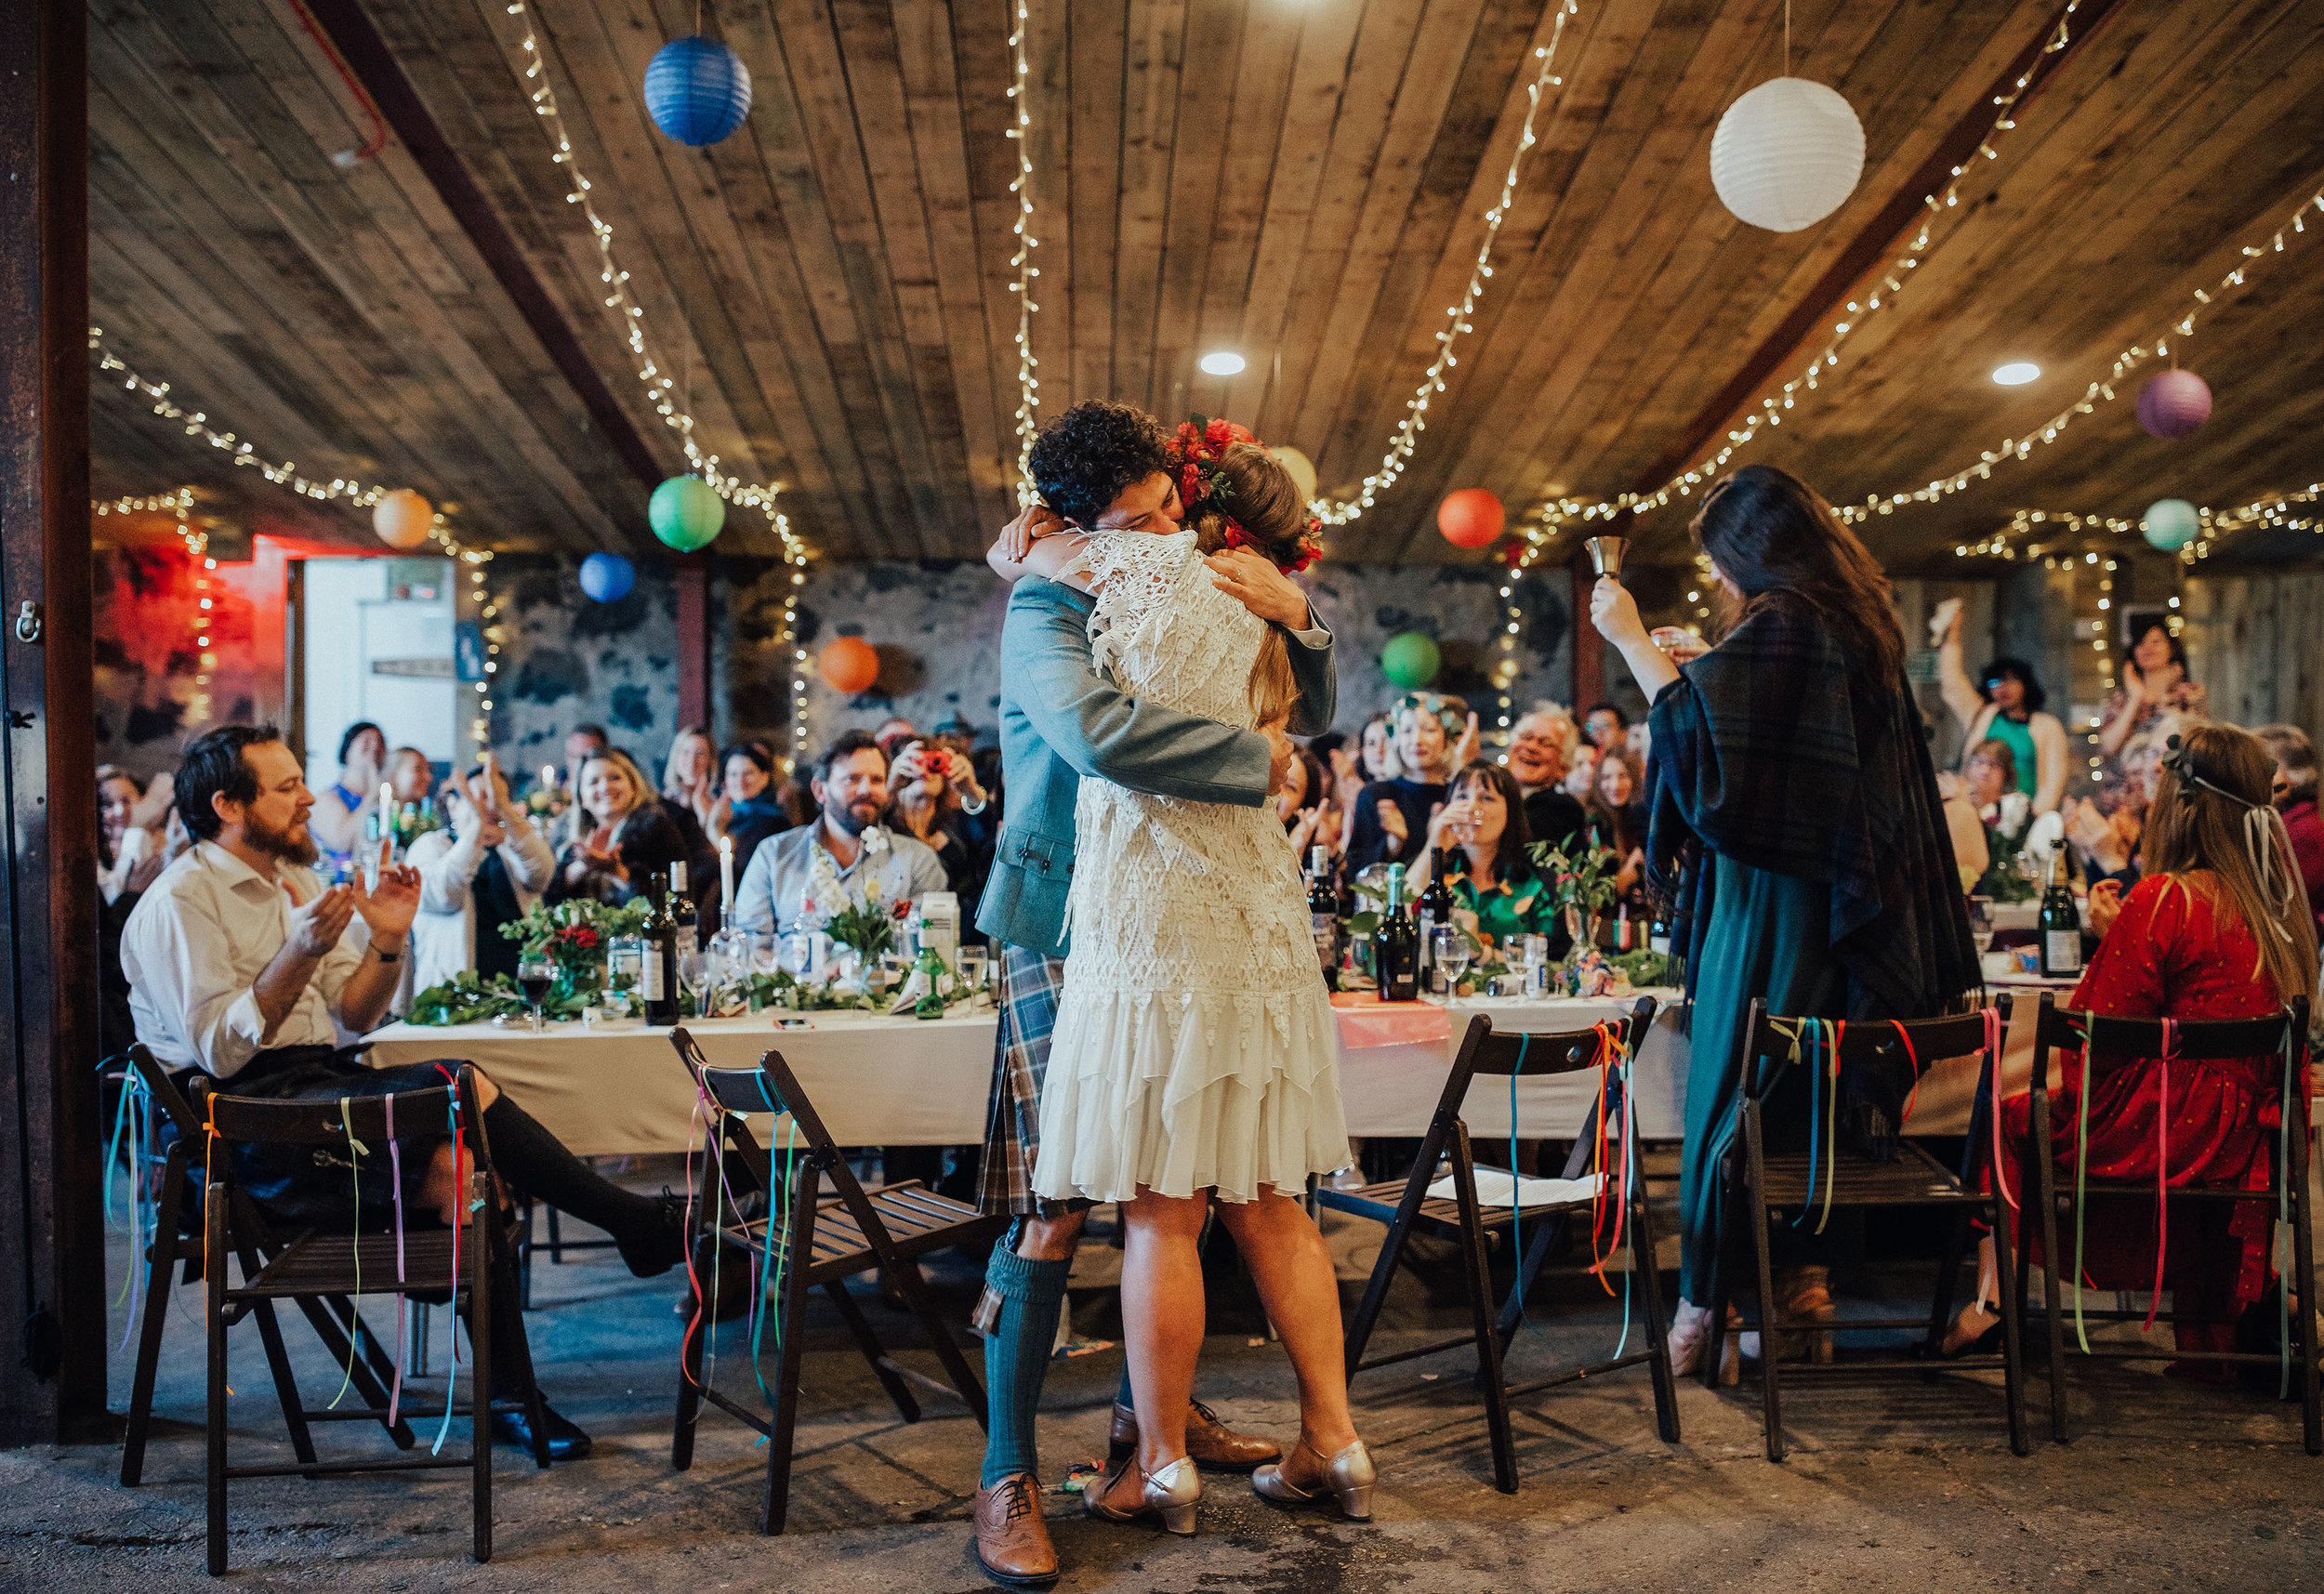 COMRIE_CROFT_WEDDINGS_PJ_PHILLIPS_PHOTOGRAPHY_164.jpg